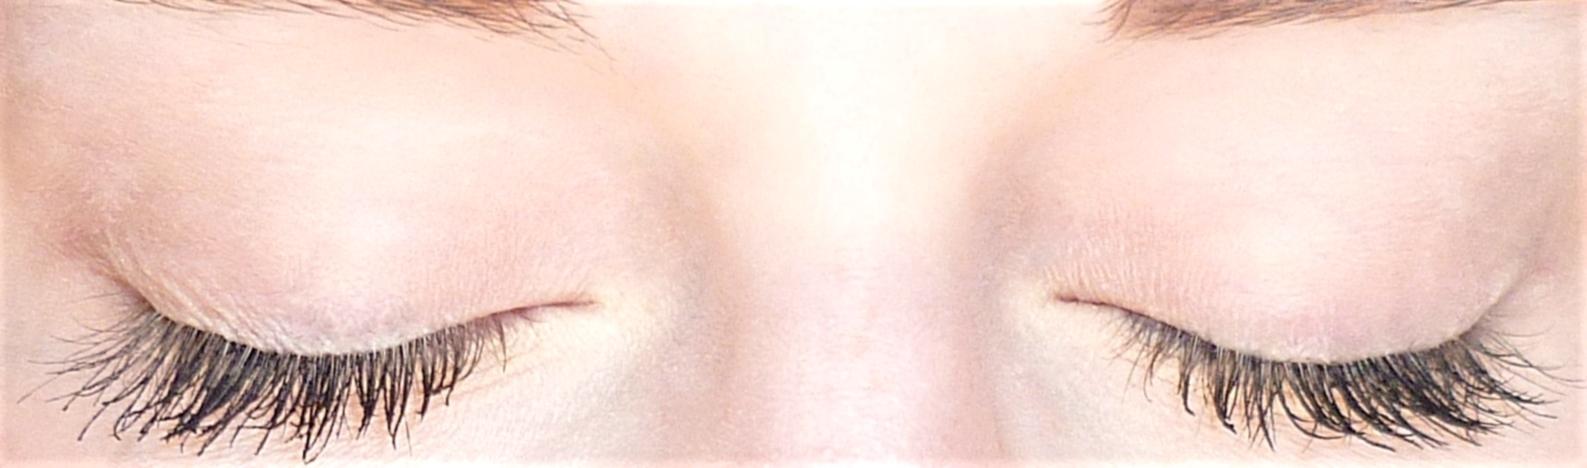 mascara avril (5)